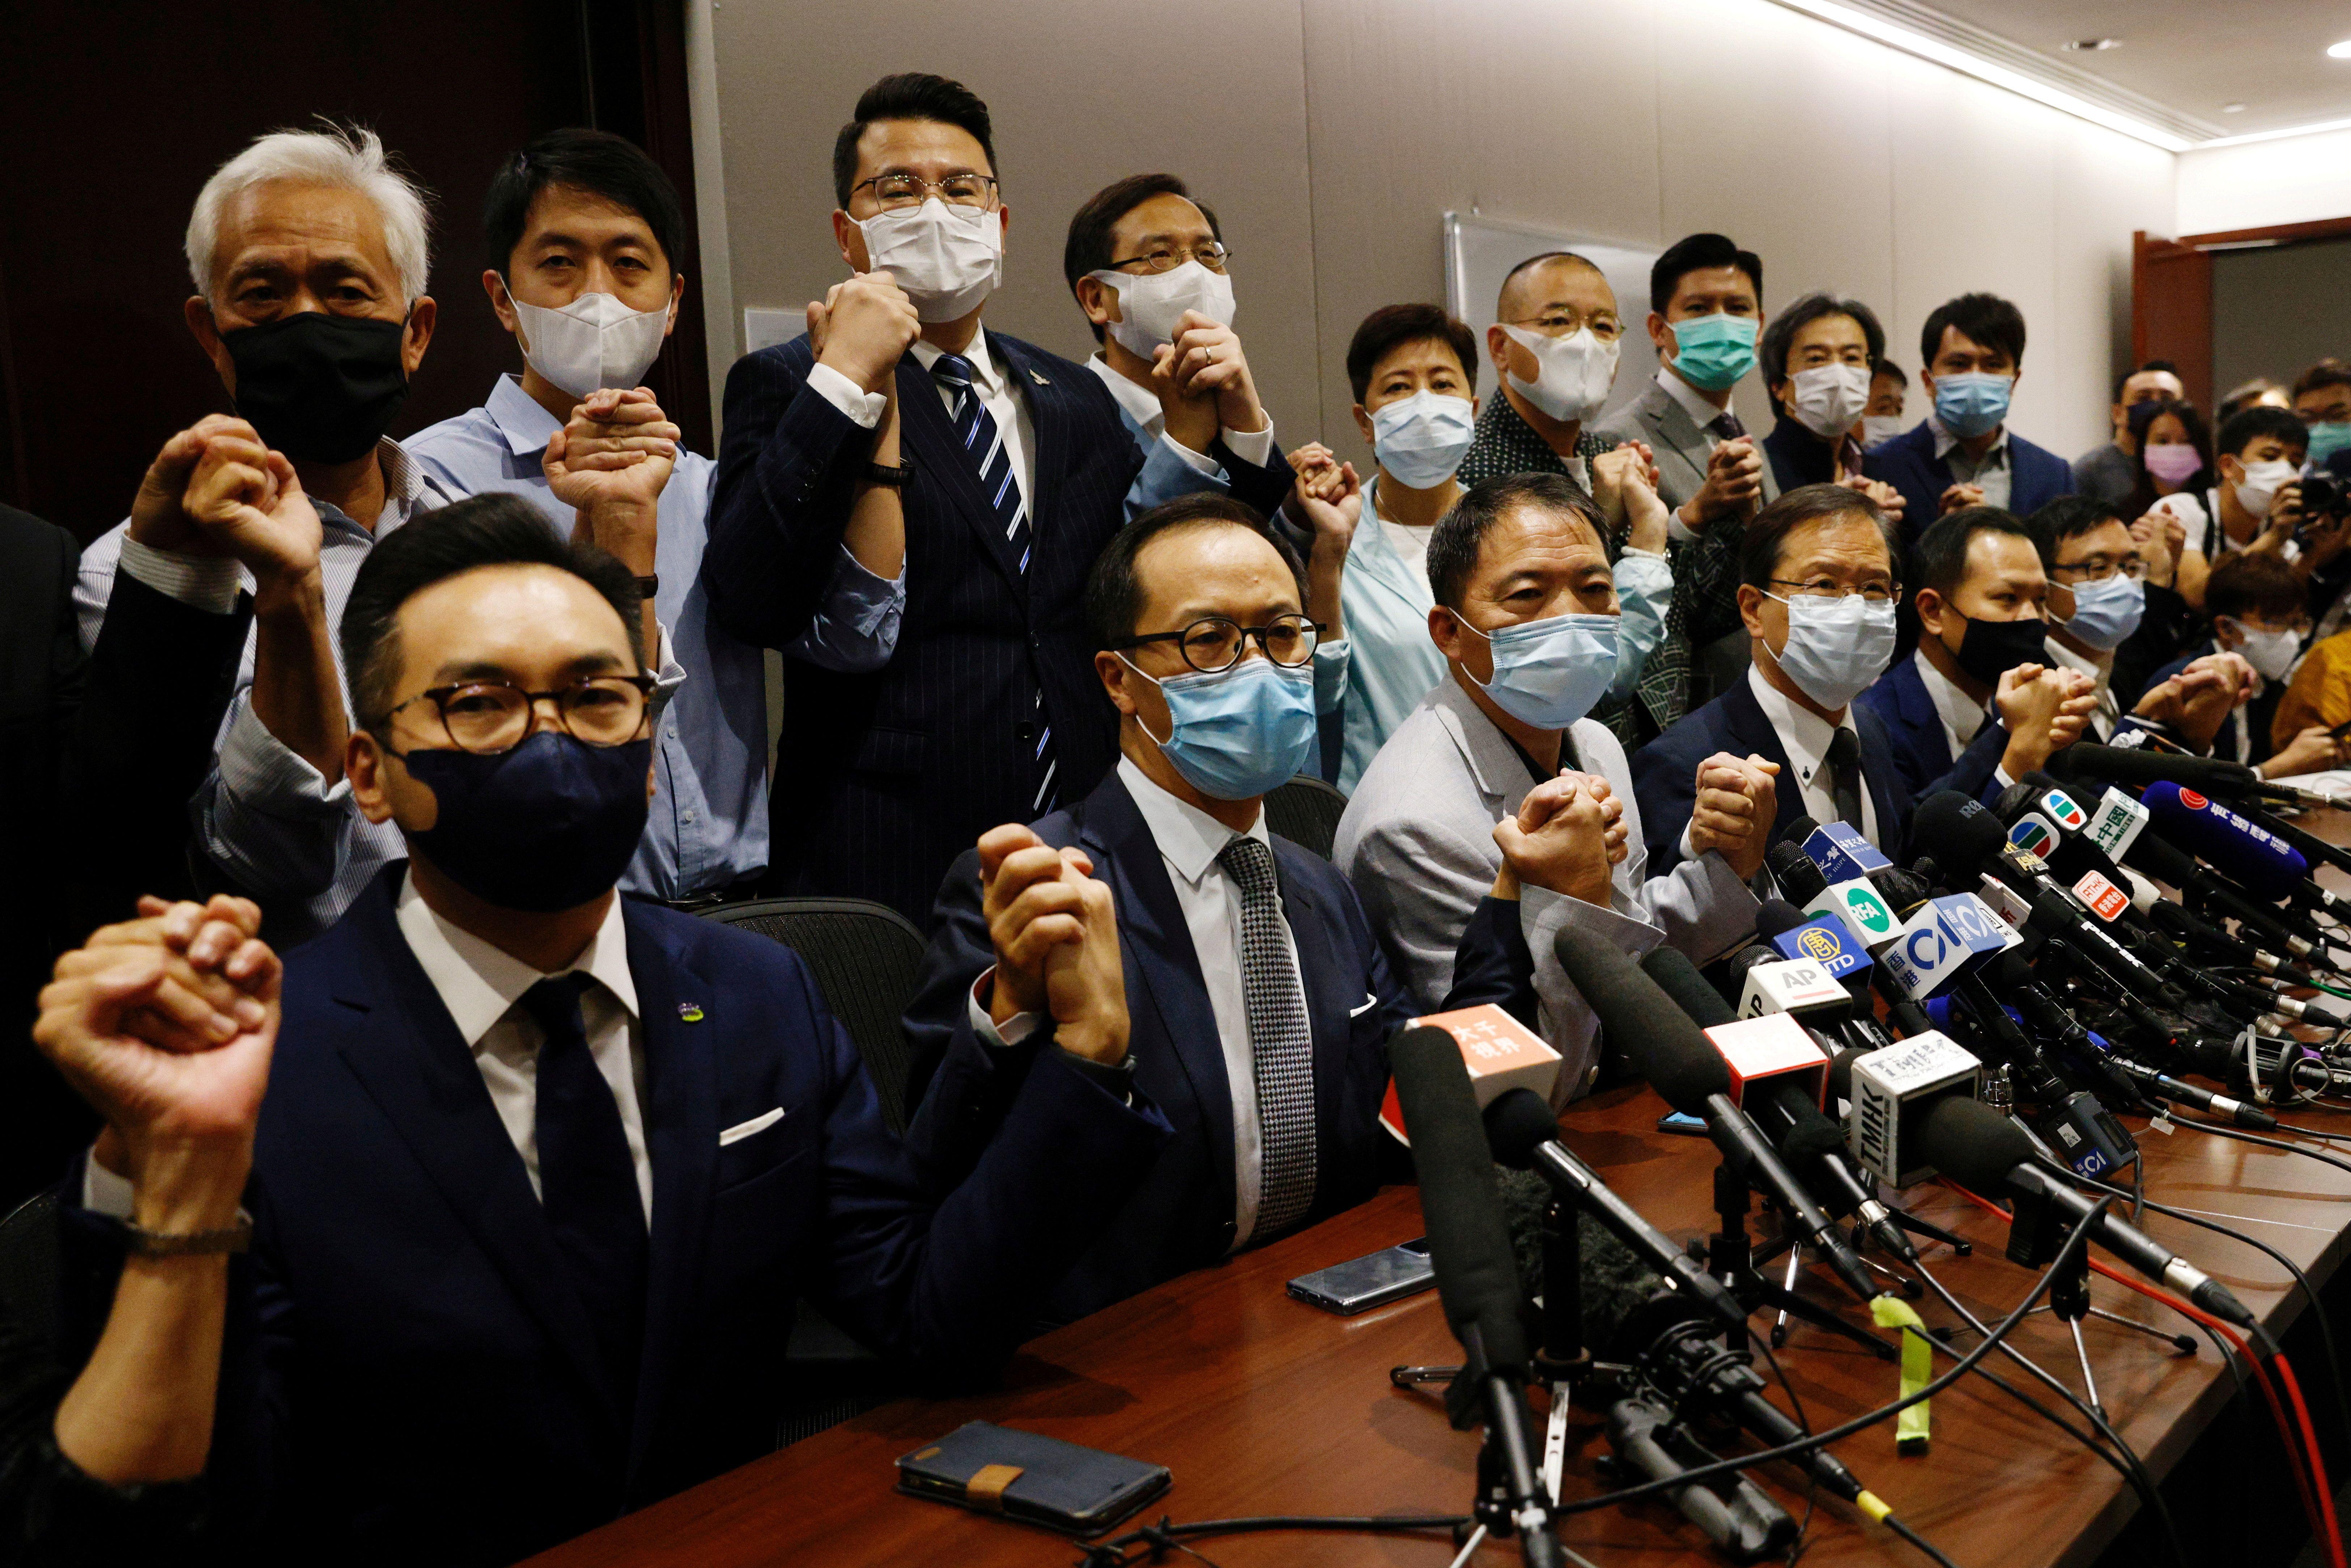 Pro-democracy legislators announce their resignation from the Legislative Council in Hong Kong. Reuters